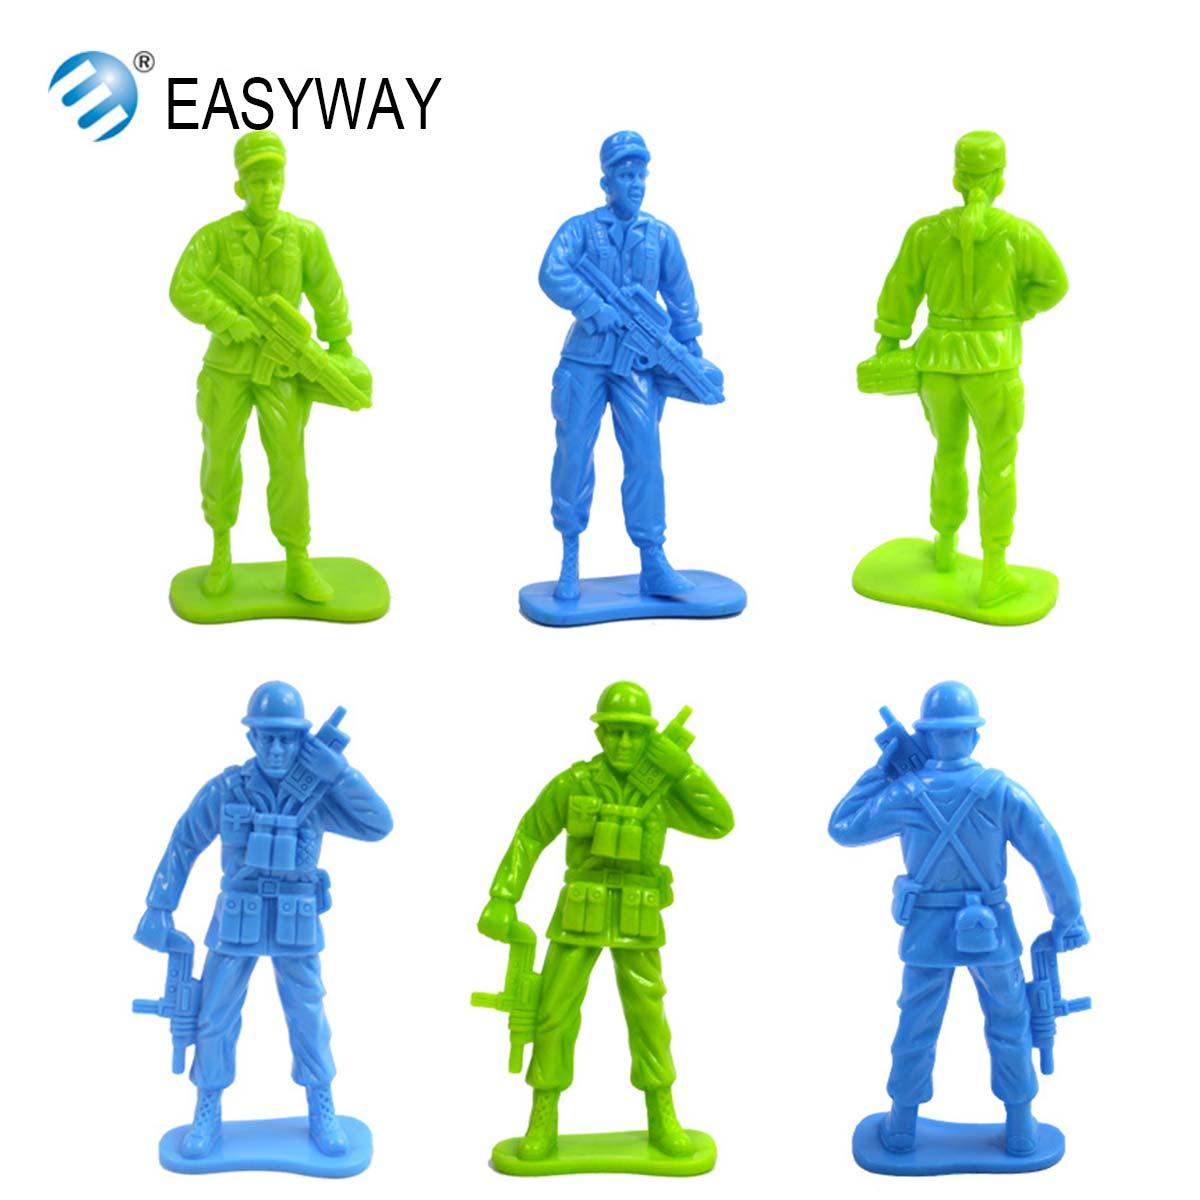 EASYWAY 1/18 Plastic Soldier Military Toys Mini Soldiers Action Figure Children Classic Toys Solid Model Set Gun DIY 12 Pcs/lot